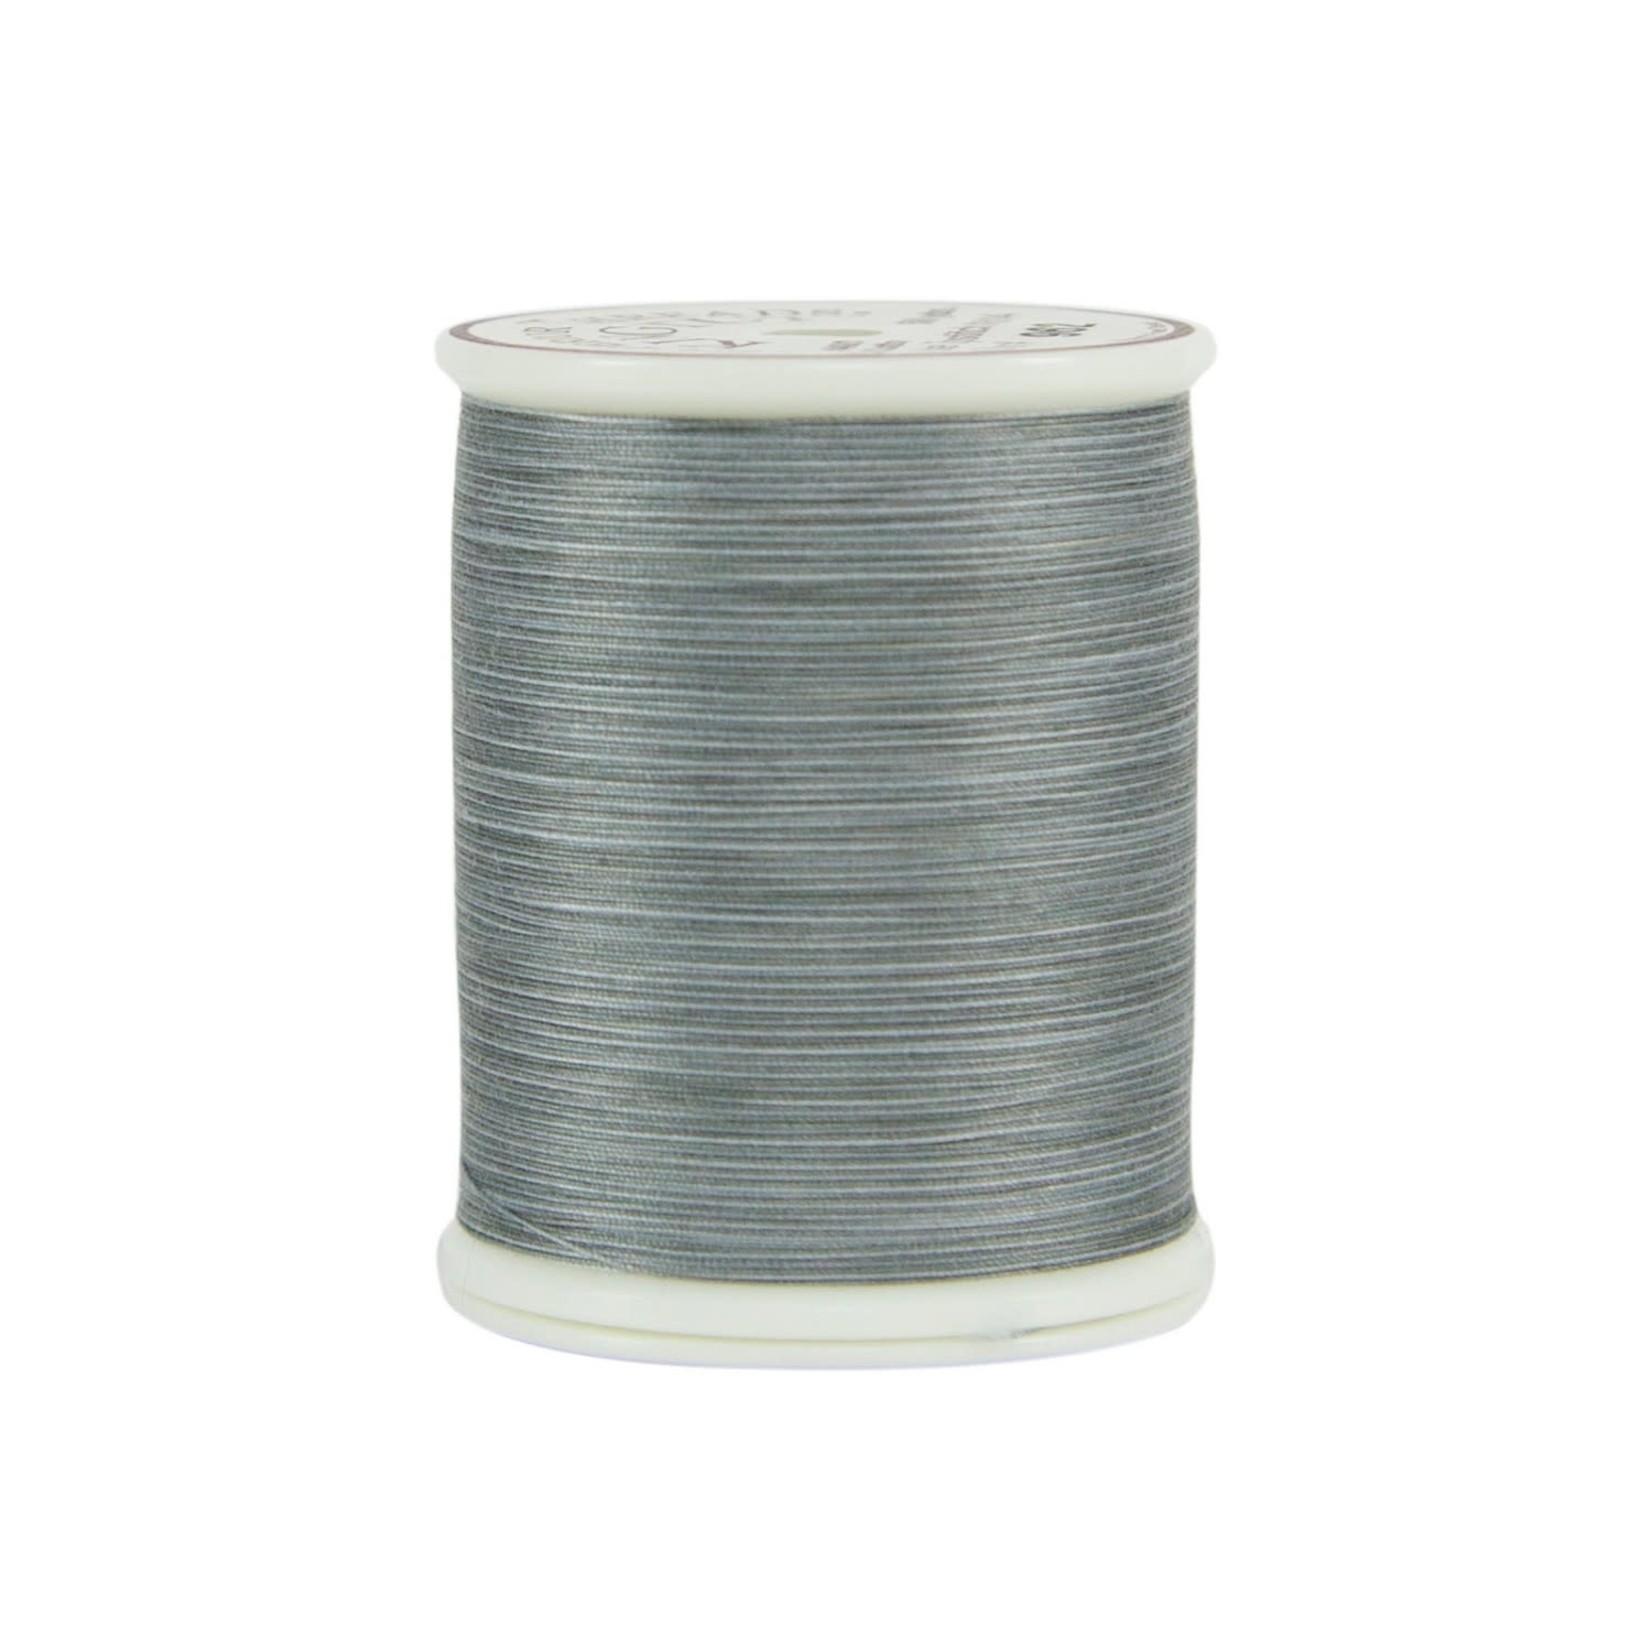 Superior Threads King Tut - #40 - 457 m - 0962 Pumice